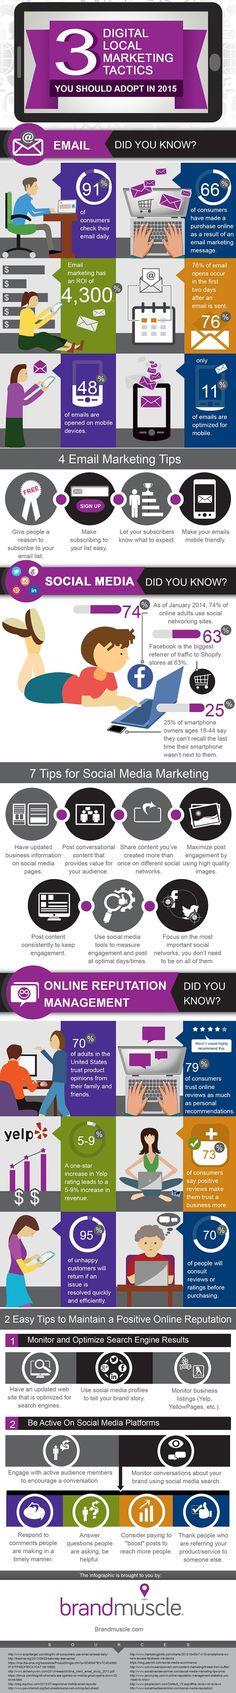 Digital Marketing (Infographic)